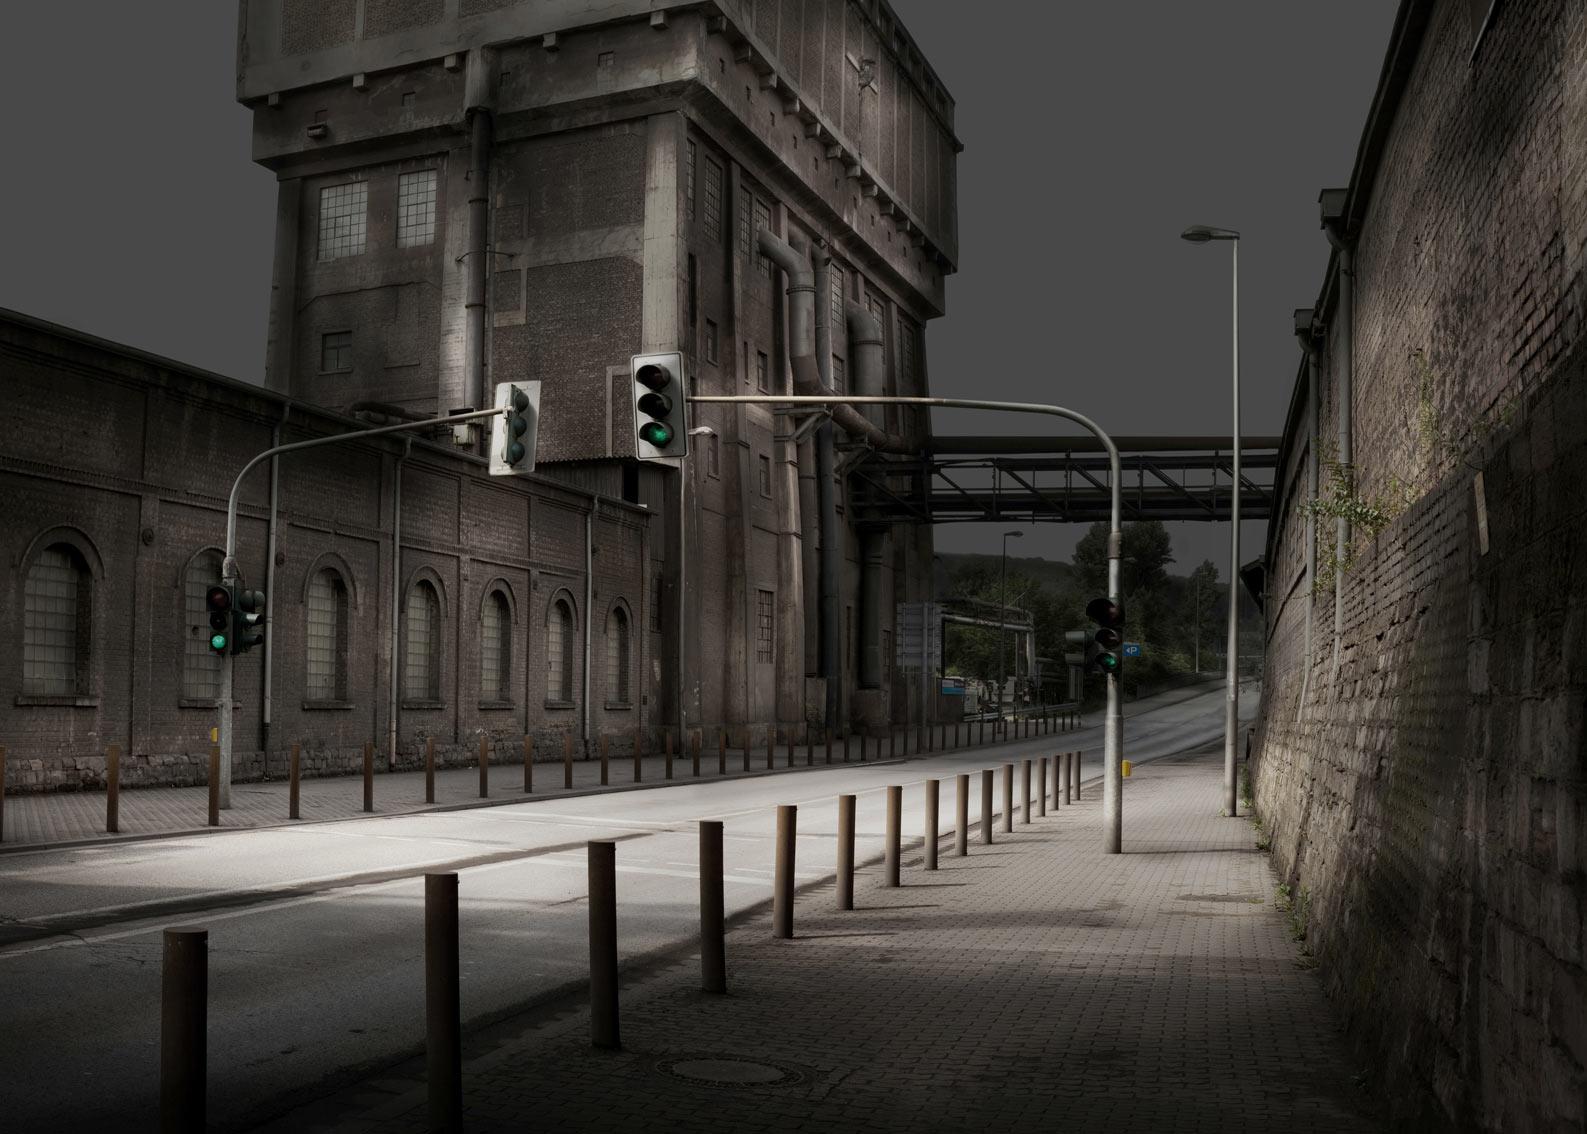 nicolas dhervillers photographe